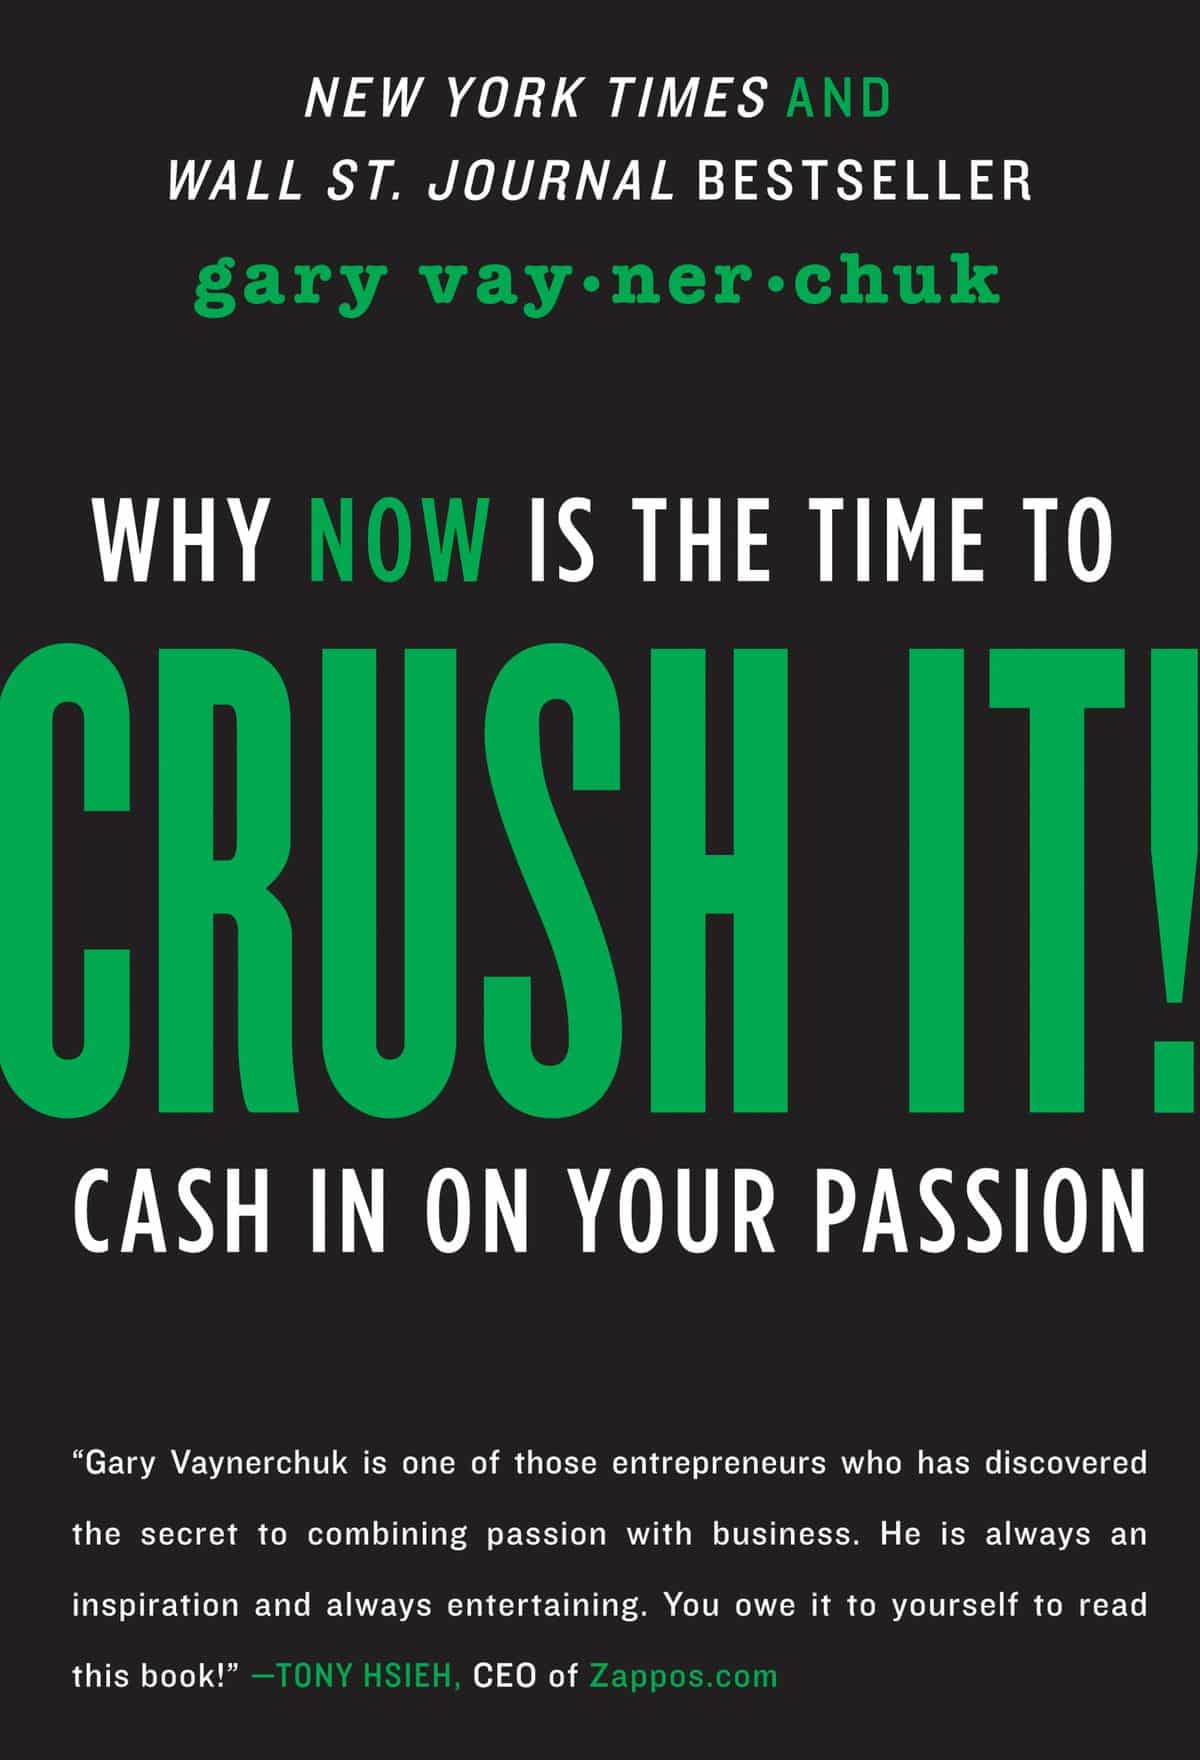 La Checklist en 21 Étapes De Gary Vaynerchuk pour Construire sa Marque Personnelle